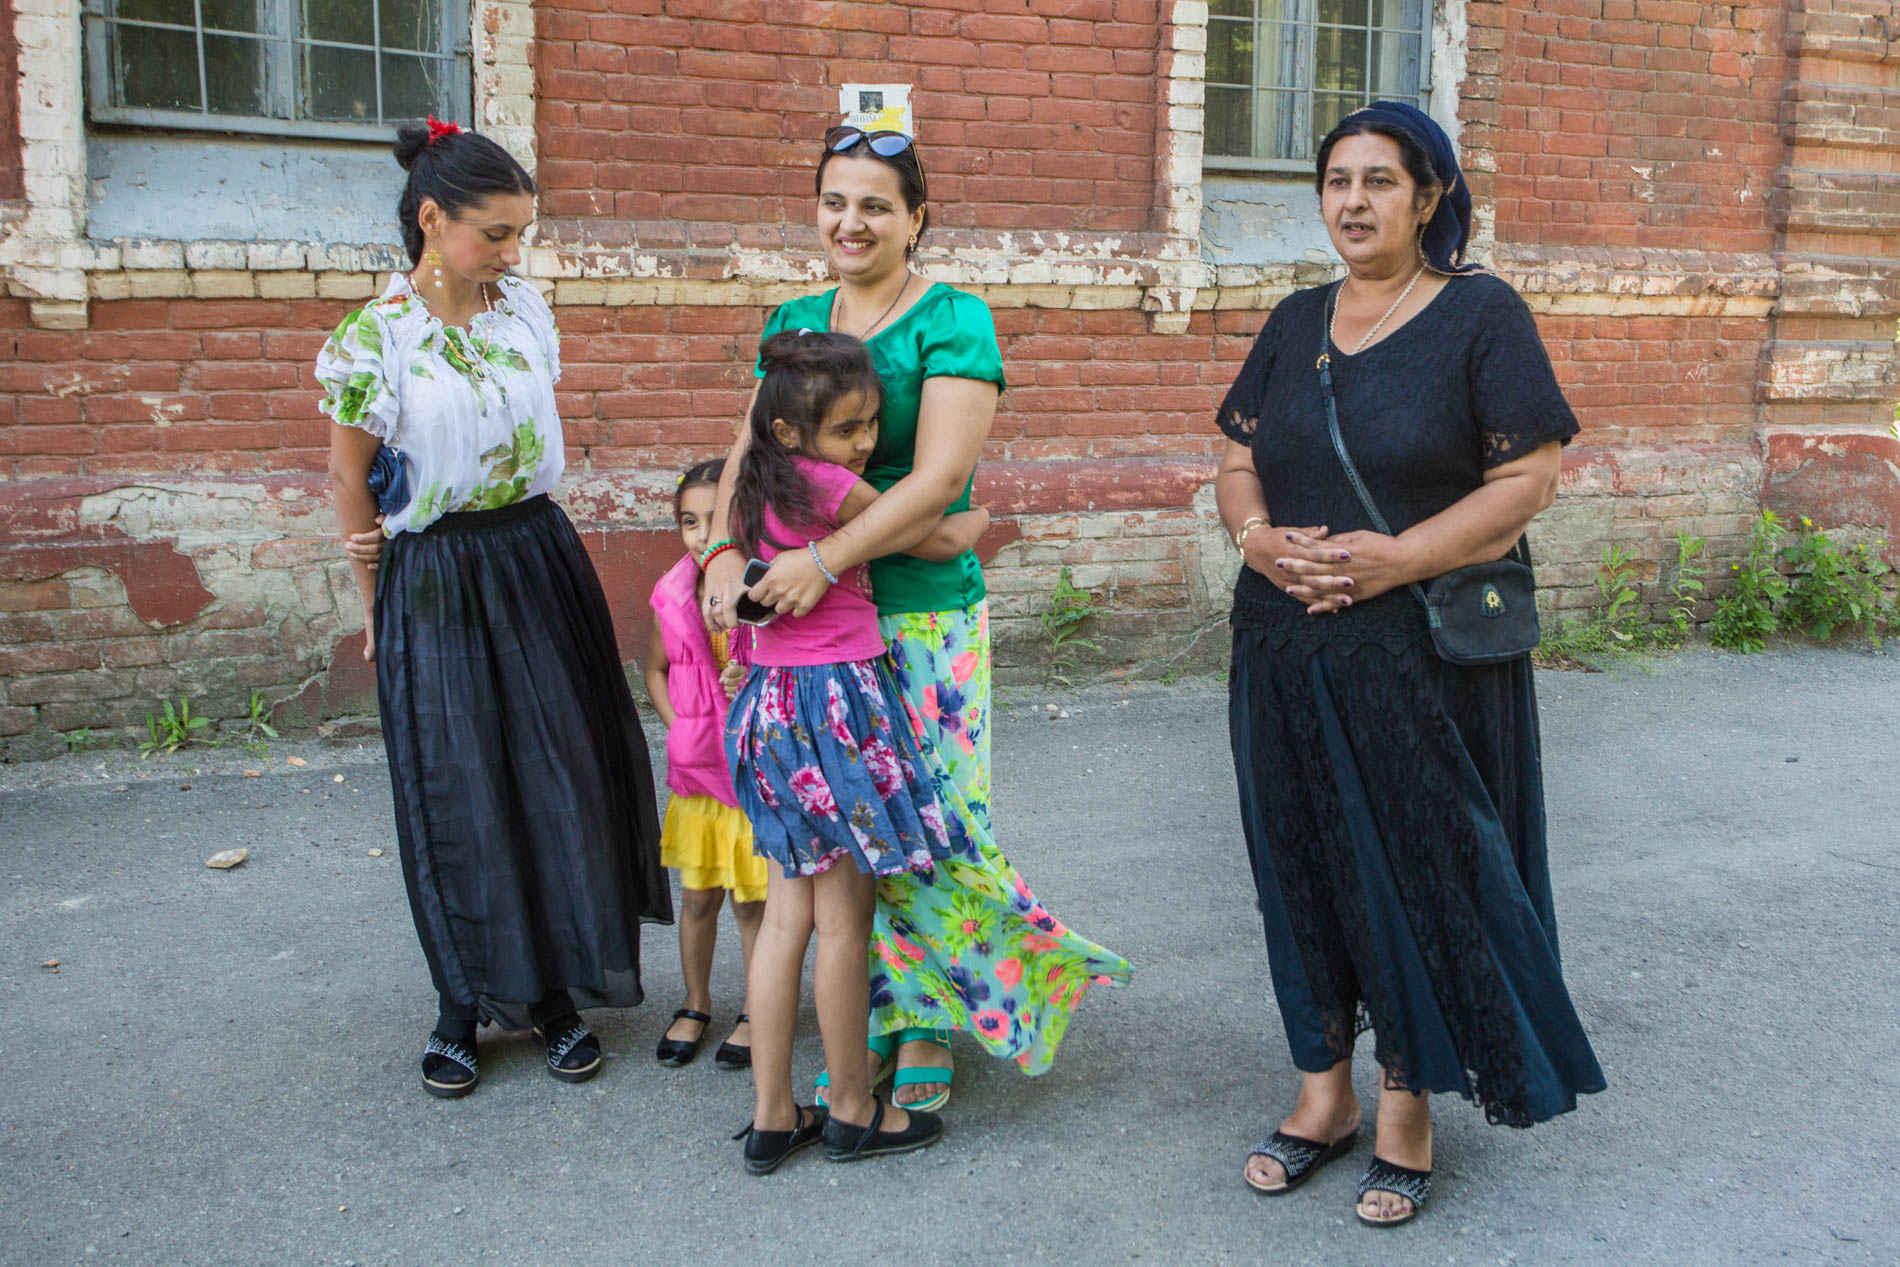 Frauen heiraten roma Namen der